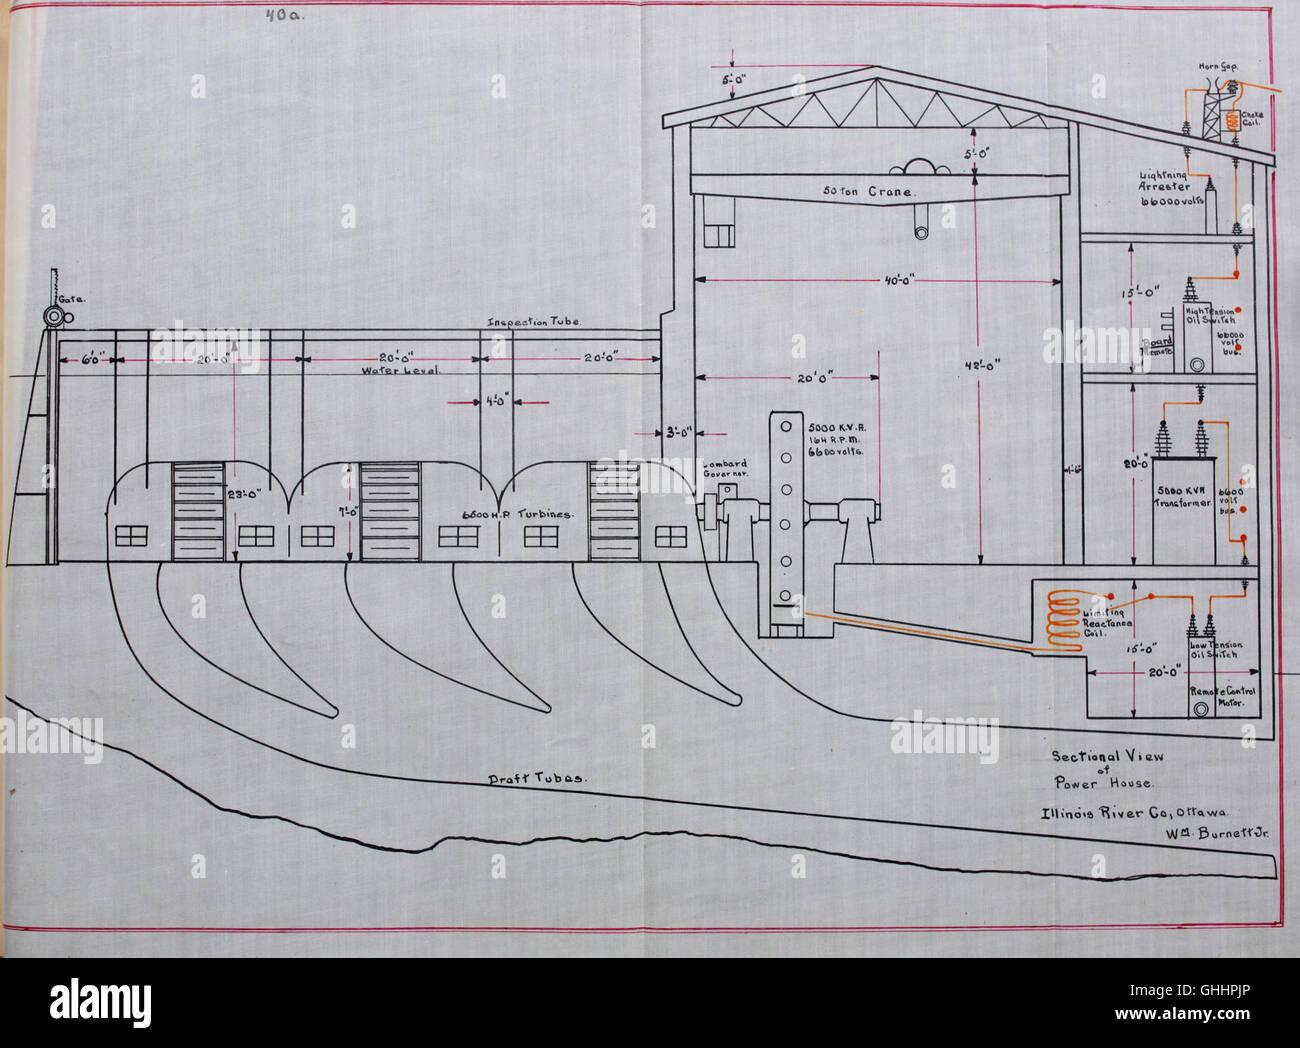 Design Hydro Electric Plant Ottawa Illinois Stock Photos Power Circuit Diagram The Of A At 1914